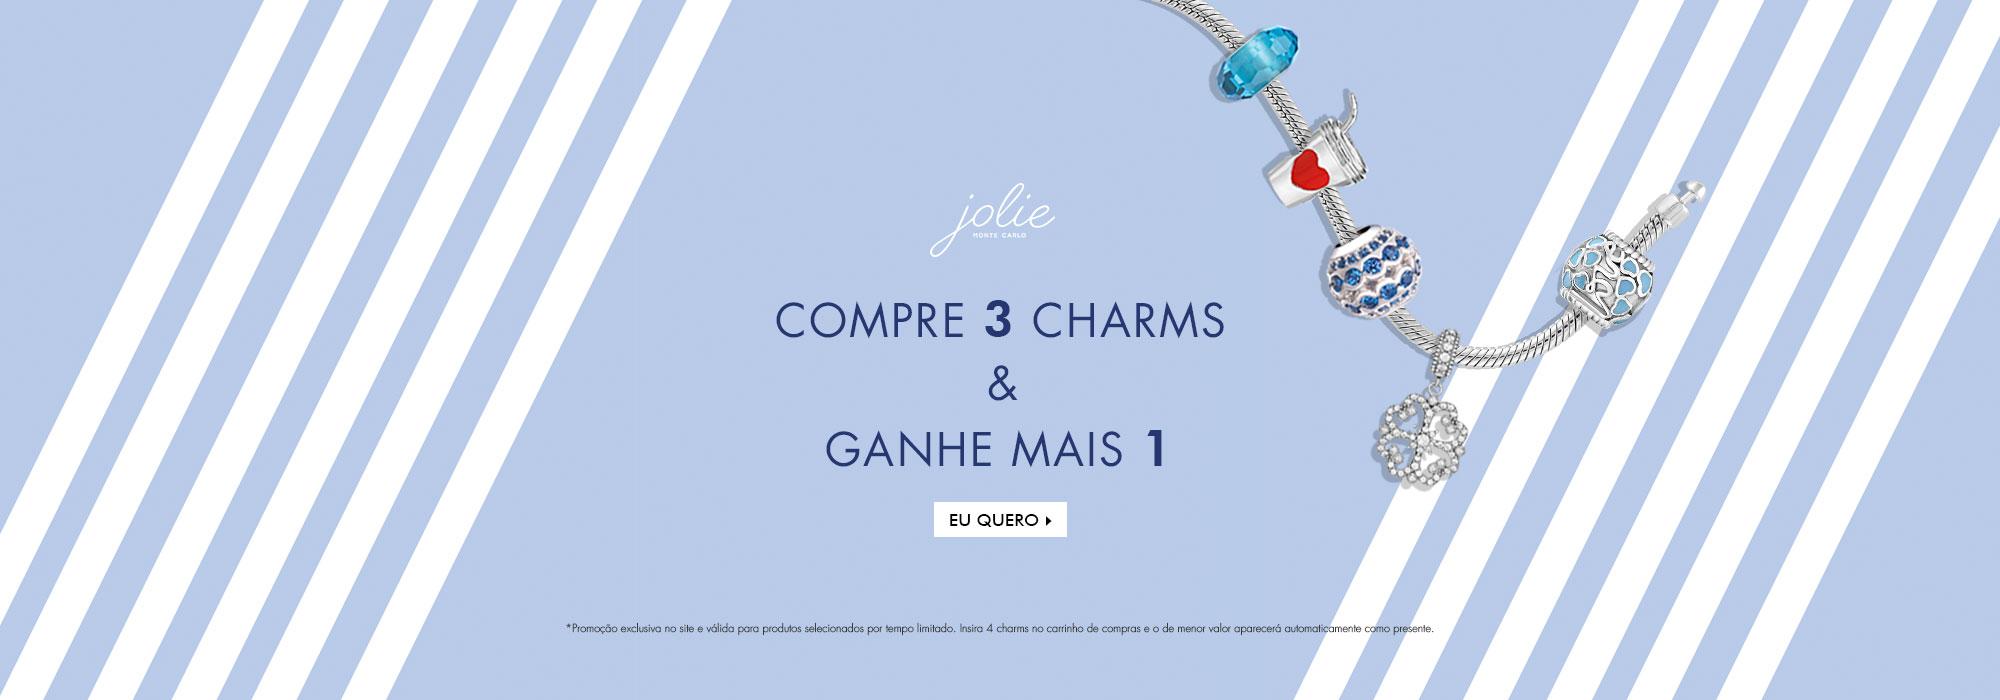 Promo Jolie